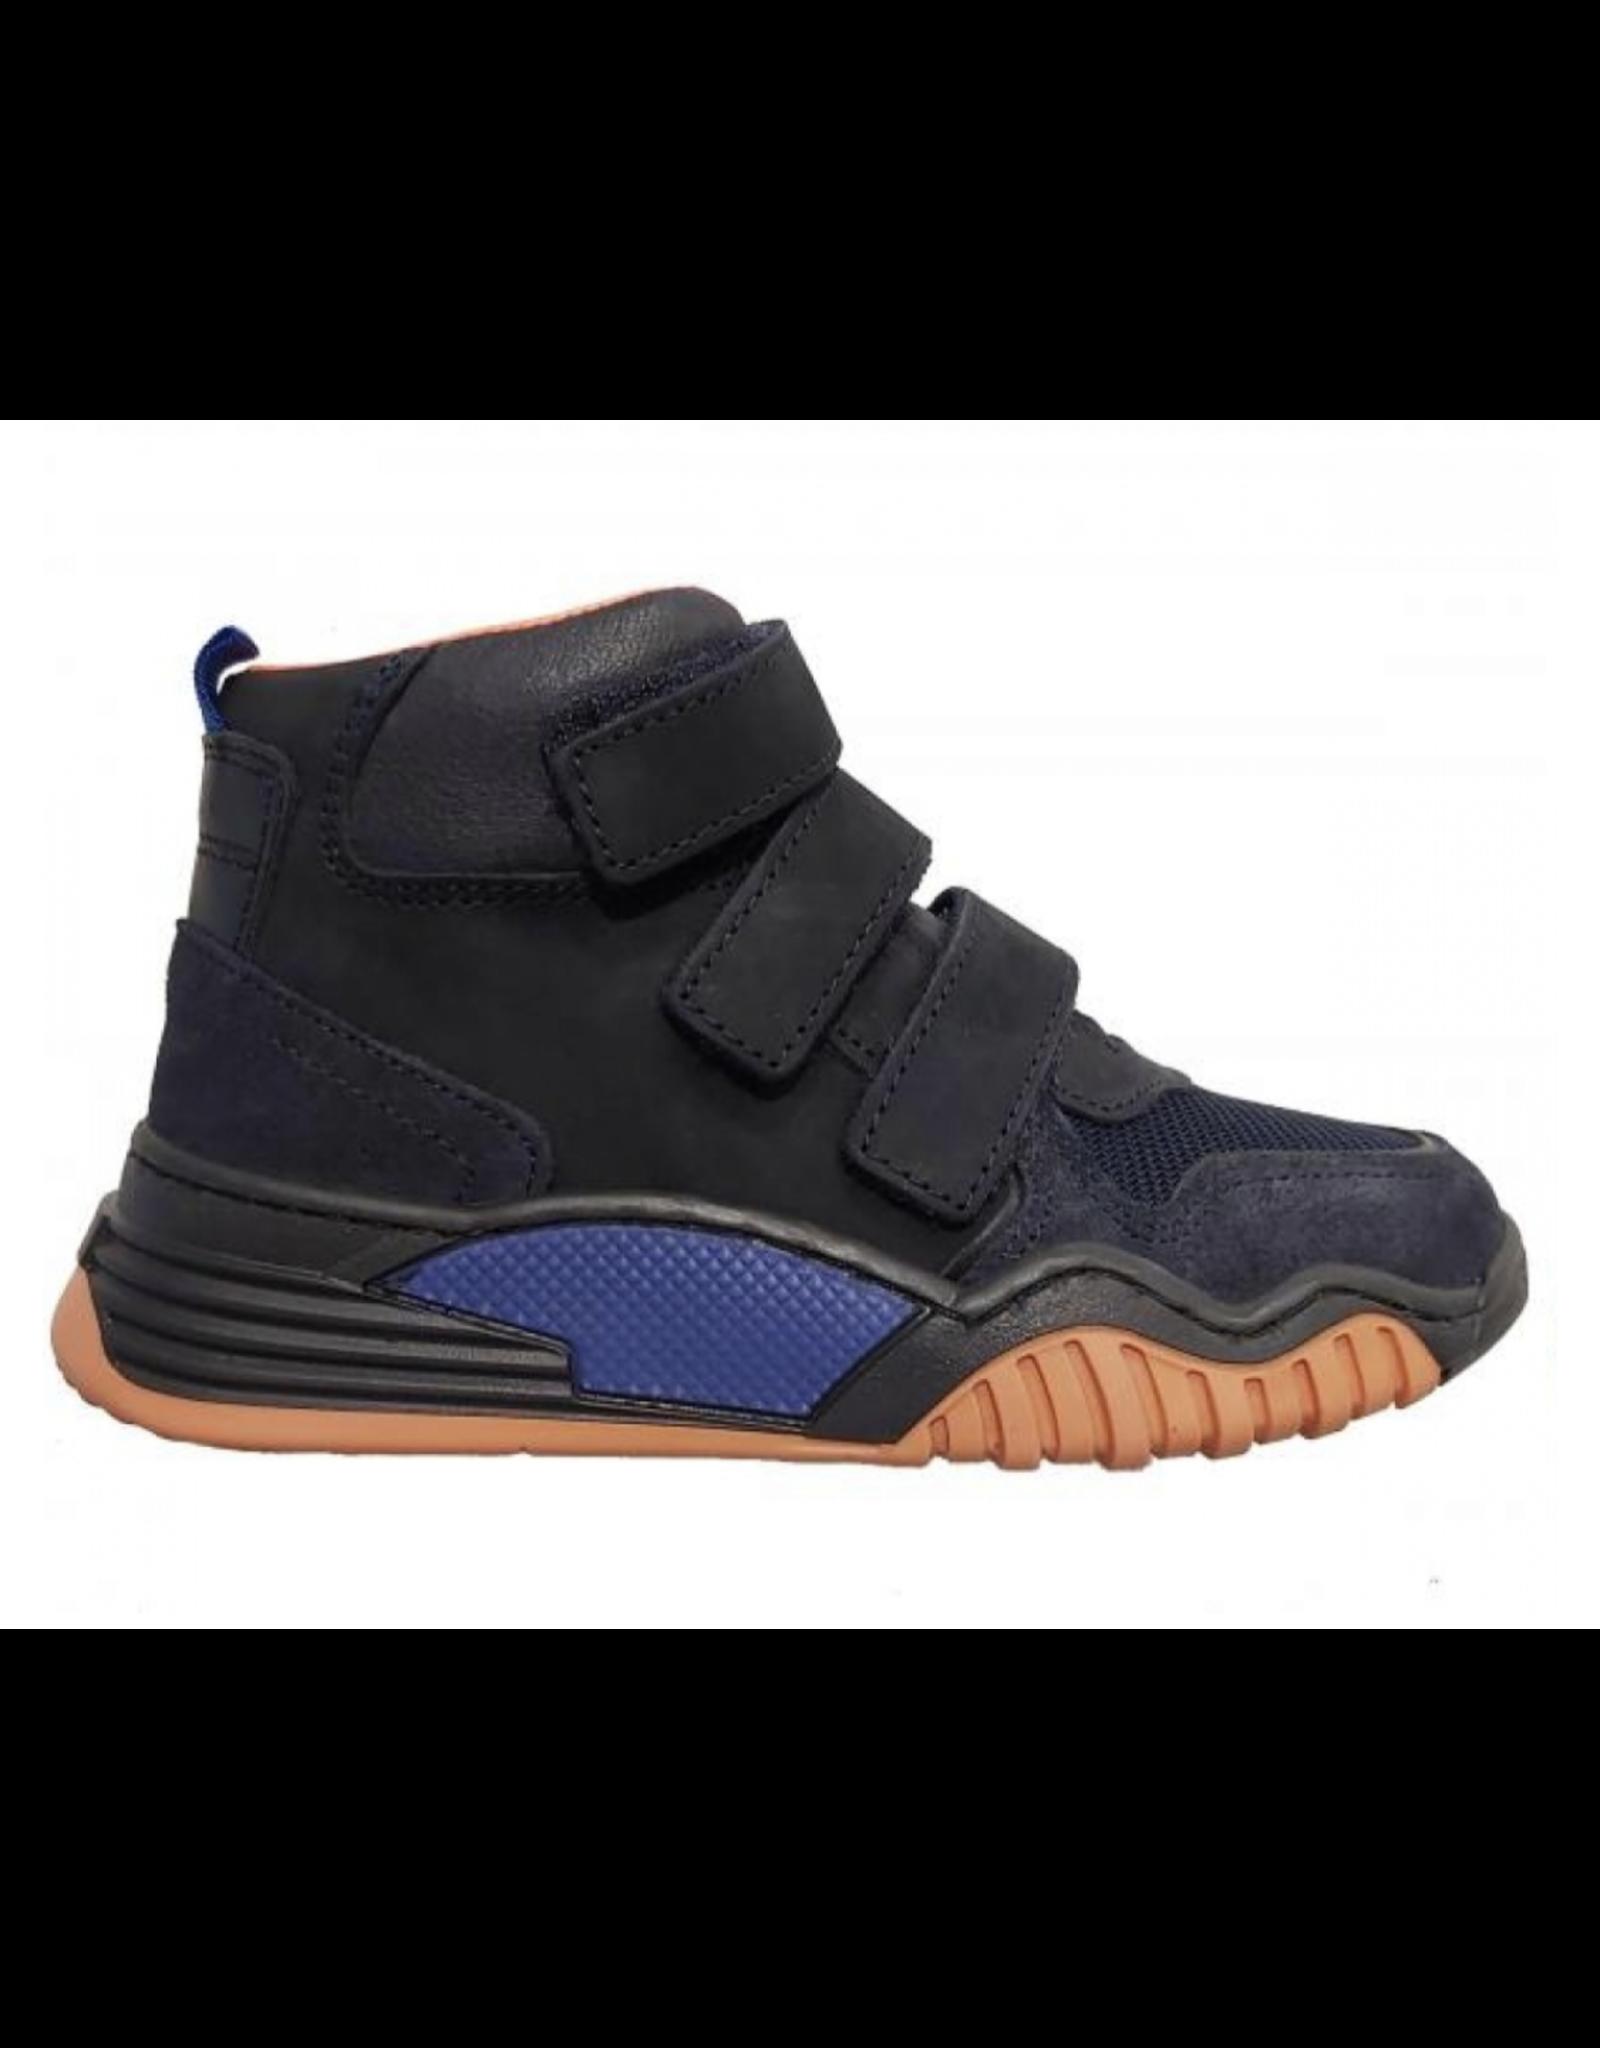 Gattino Gattino - Kinderschoen Sneaker Navy